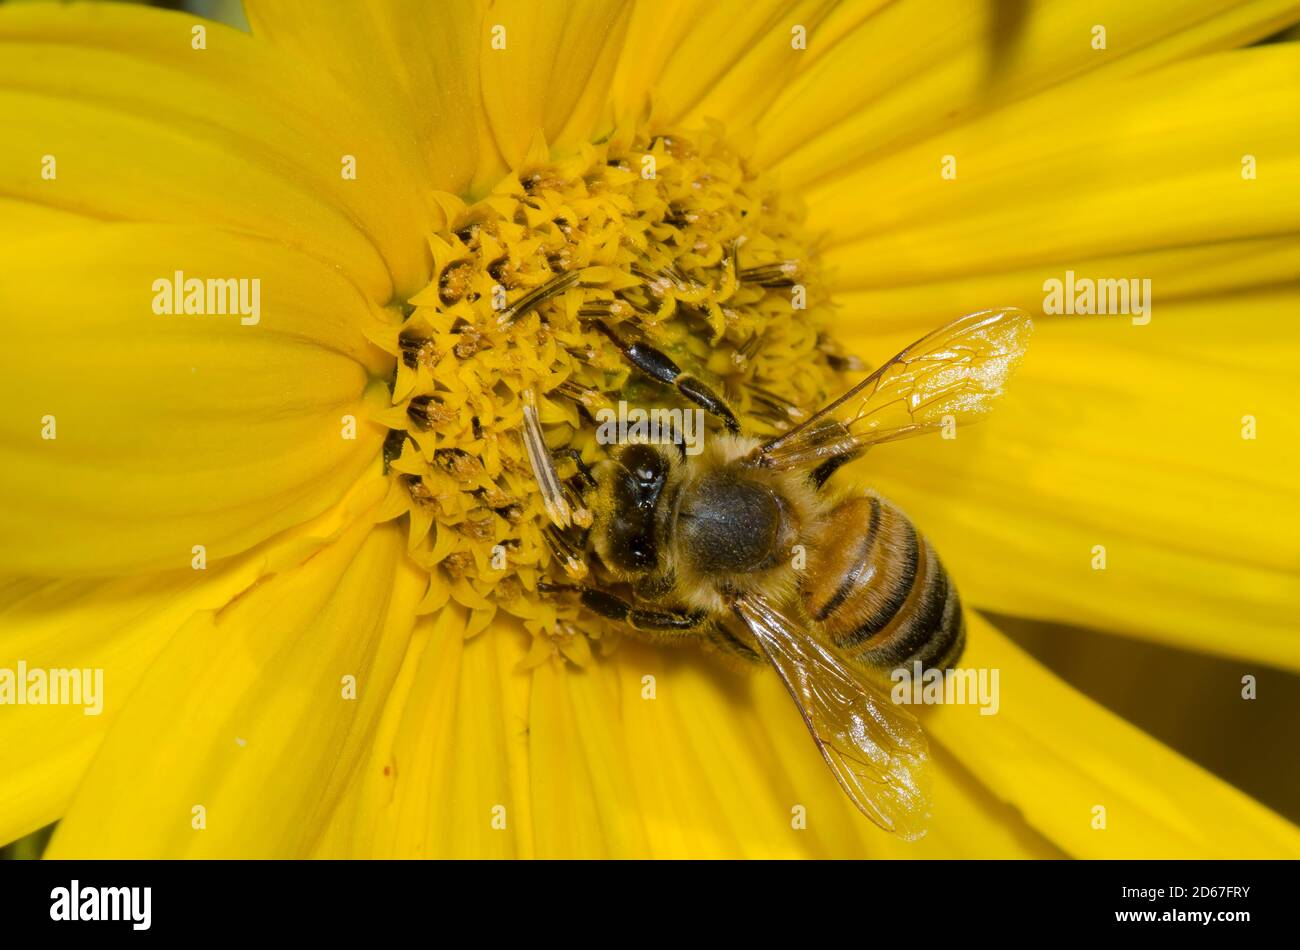 Honey Bee, Apis mellifera, foraging on Maximilian sunflower, Helianthus maximiliani Stock Photo